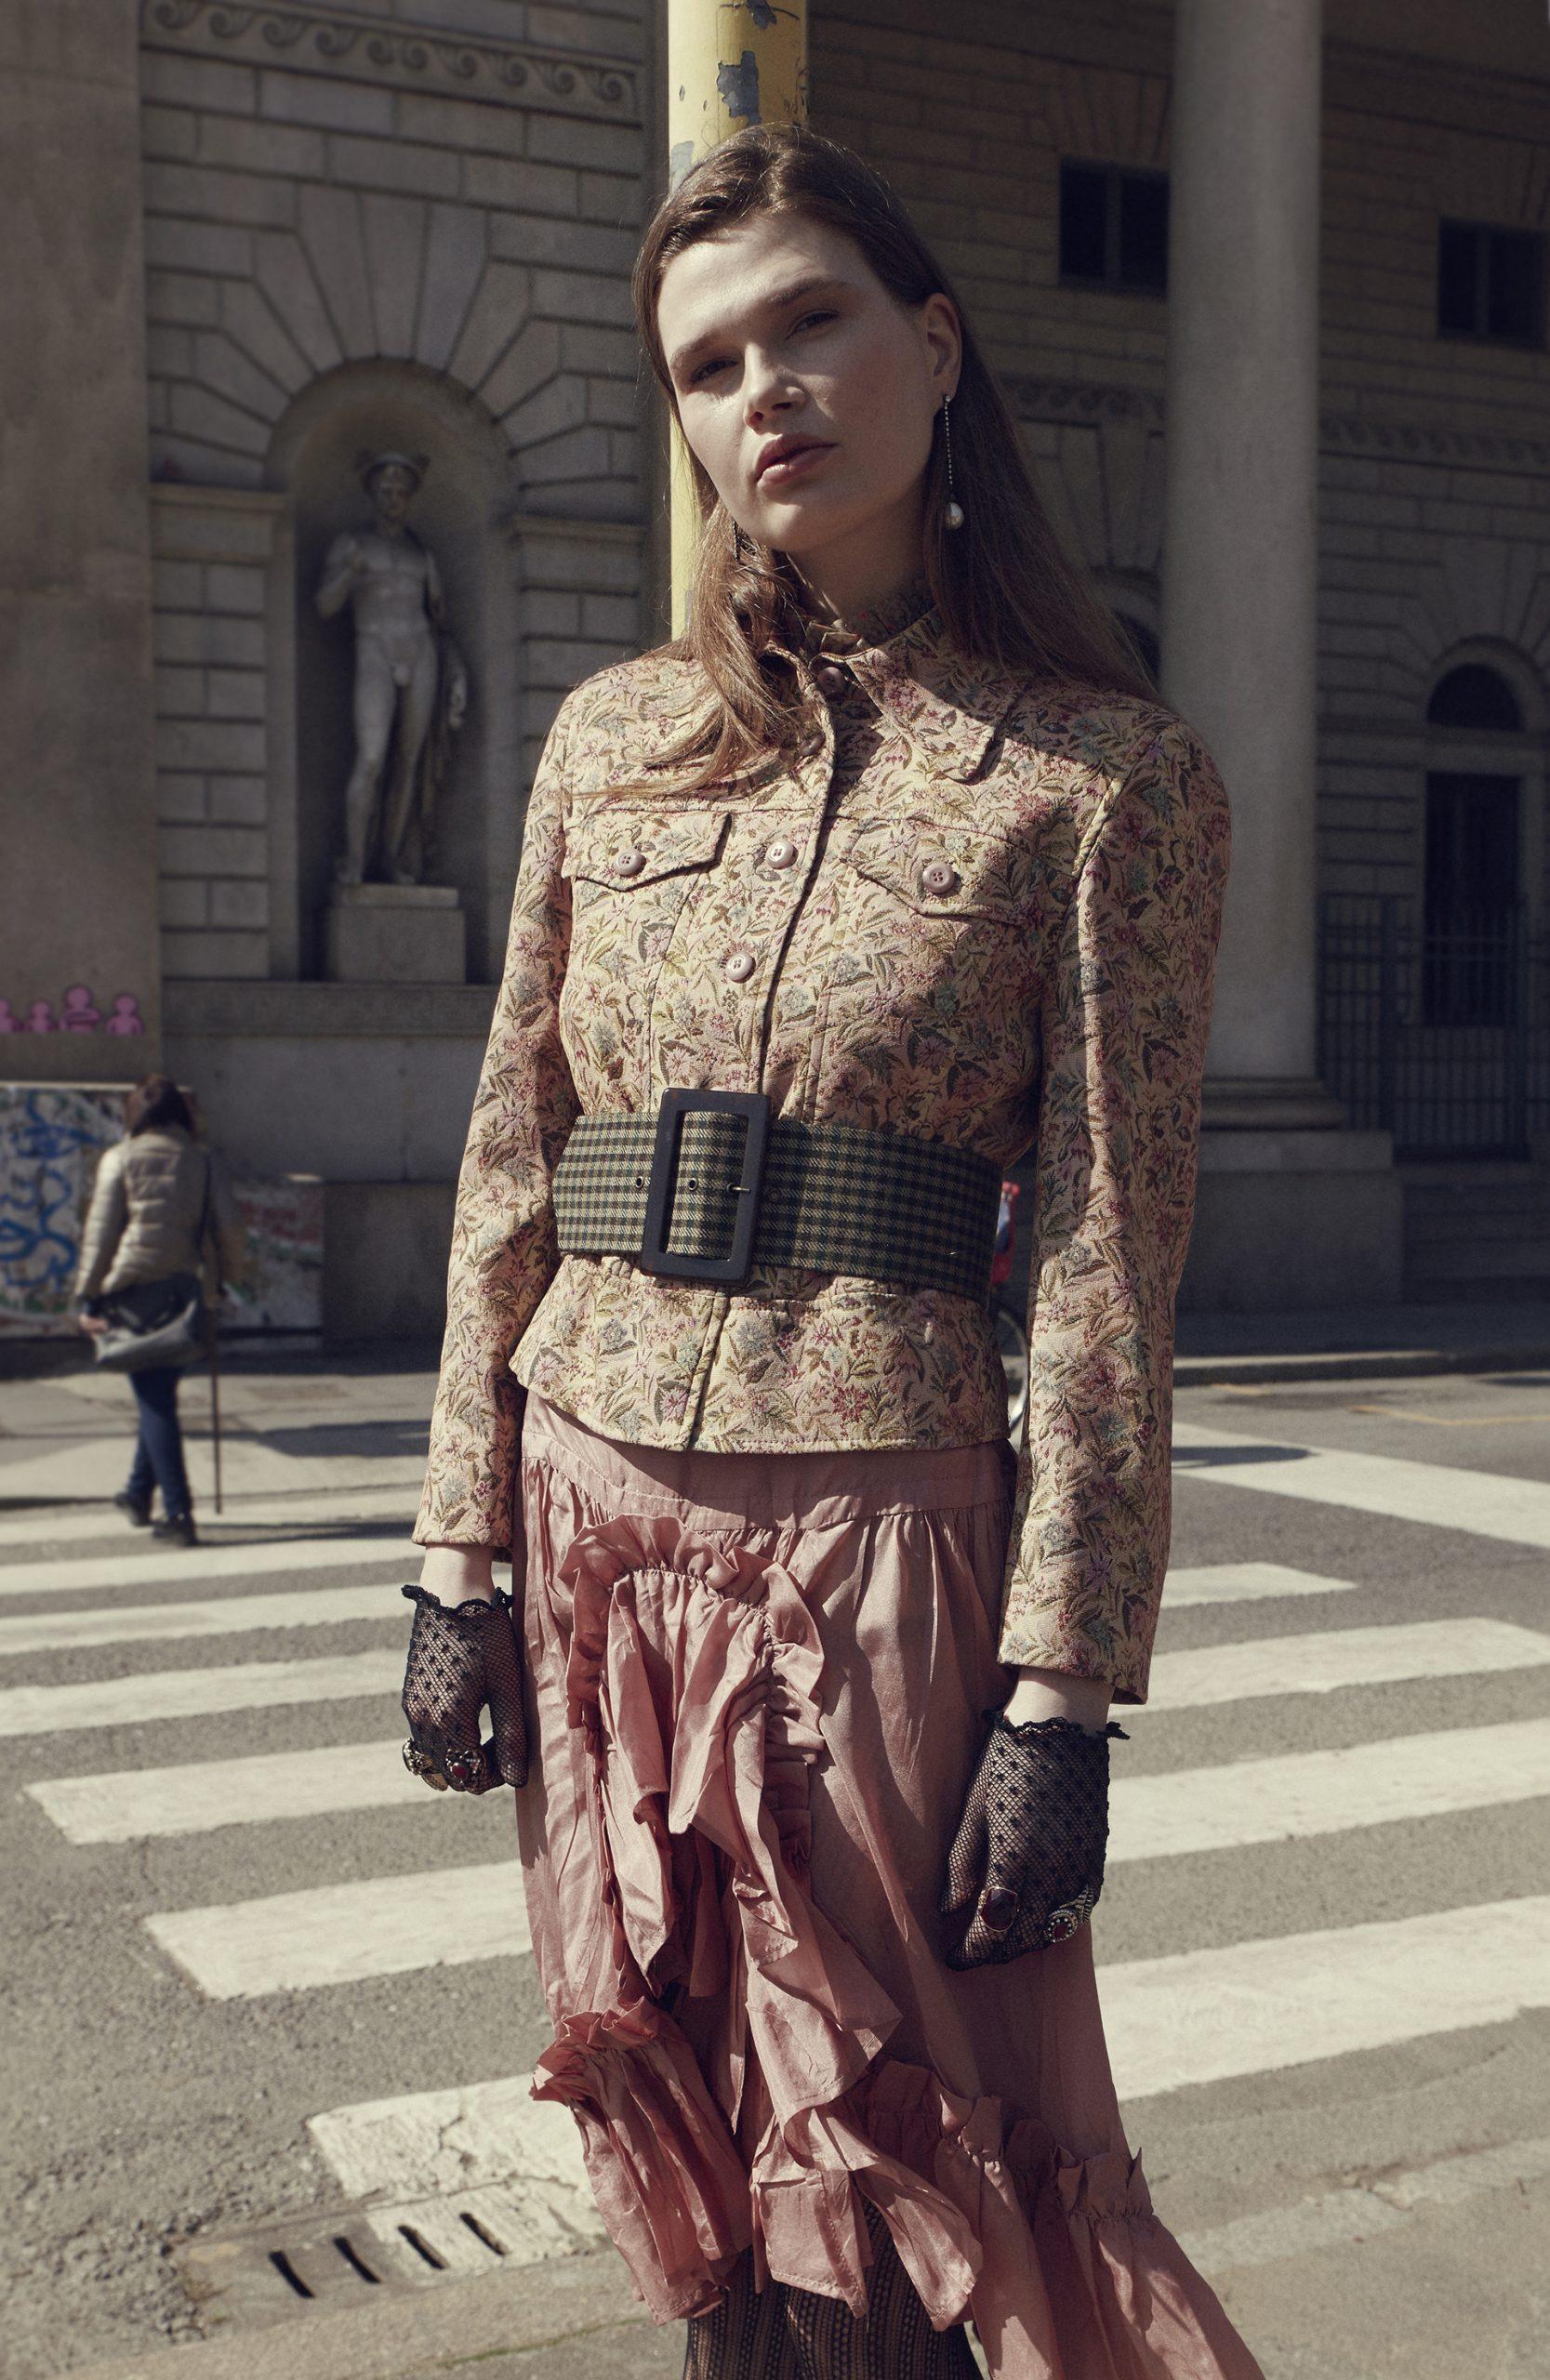 editoriale moda The Now Retrophilia, styling, mirko pedone, gonna krizia, camicia pinko,